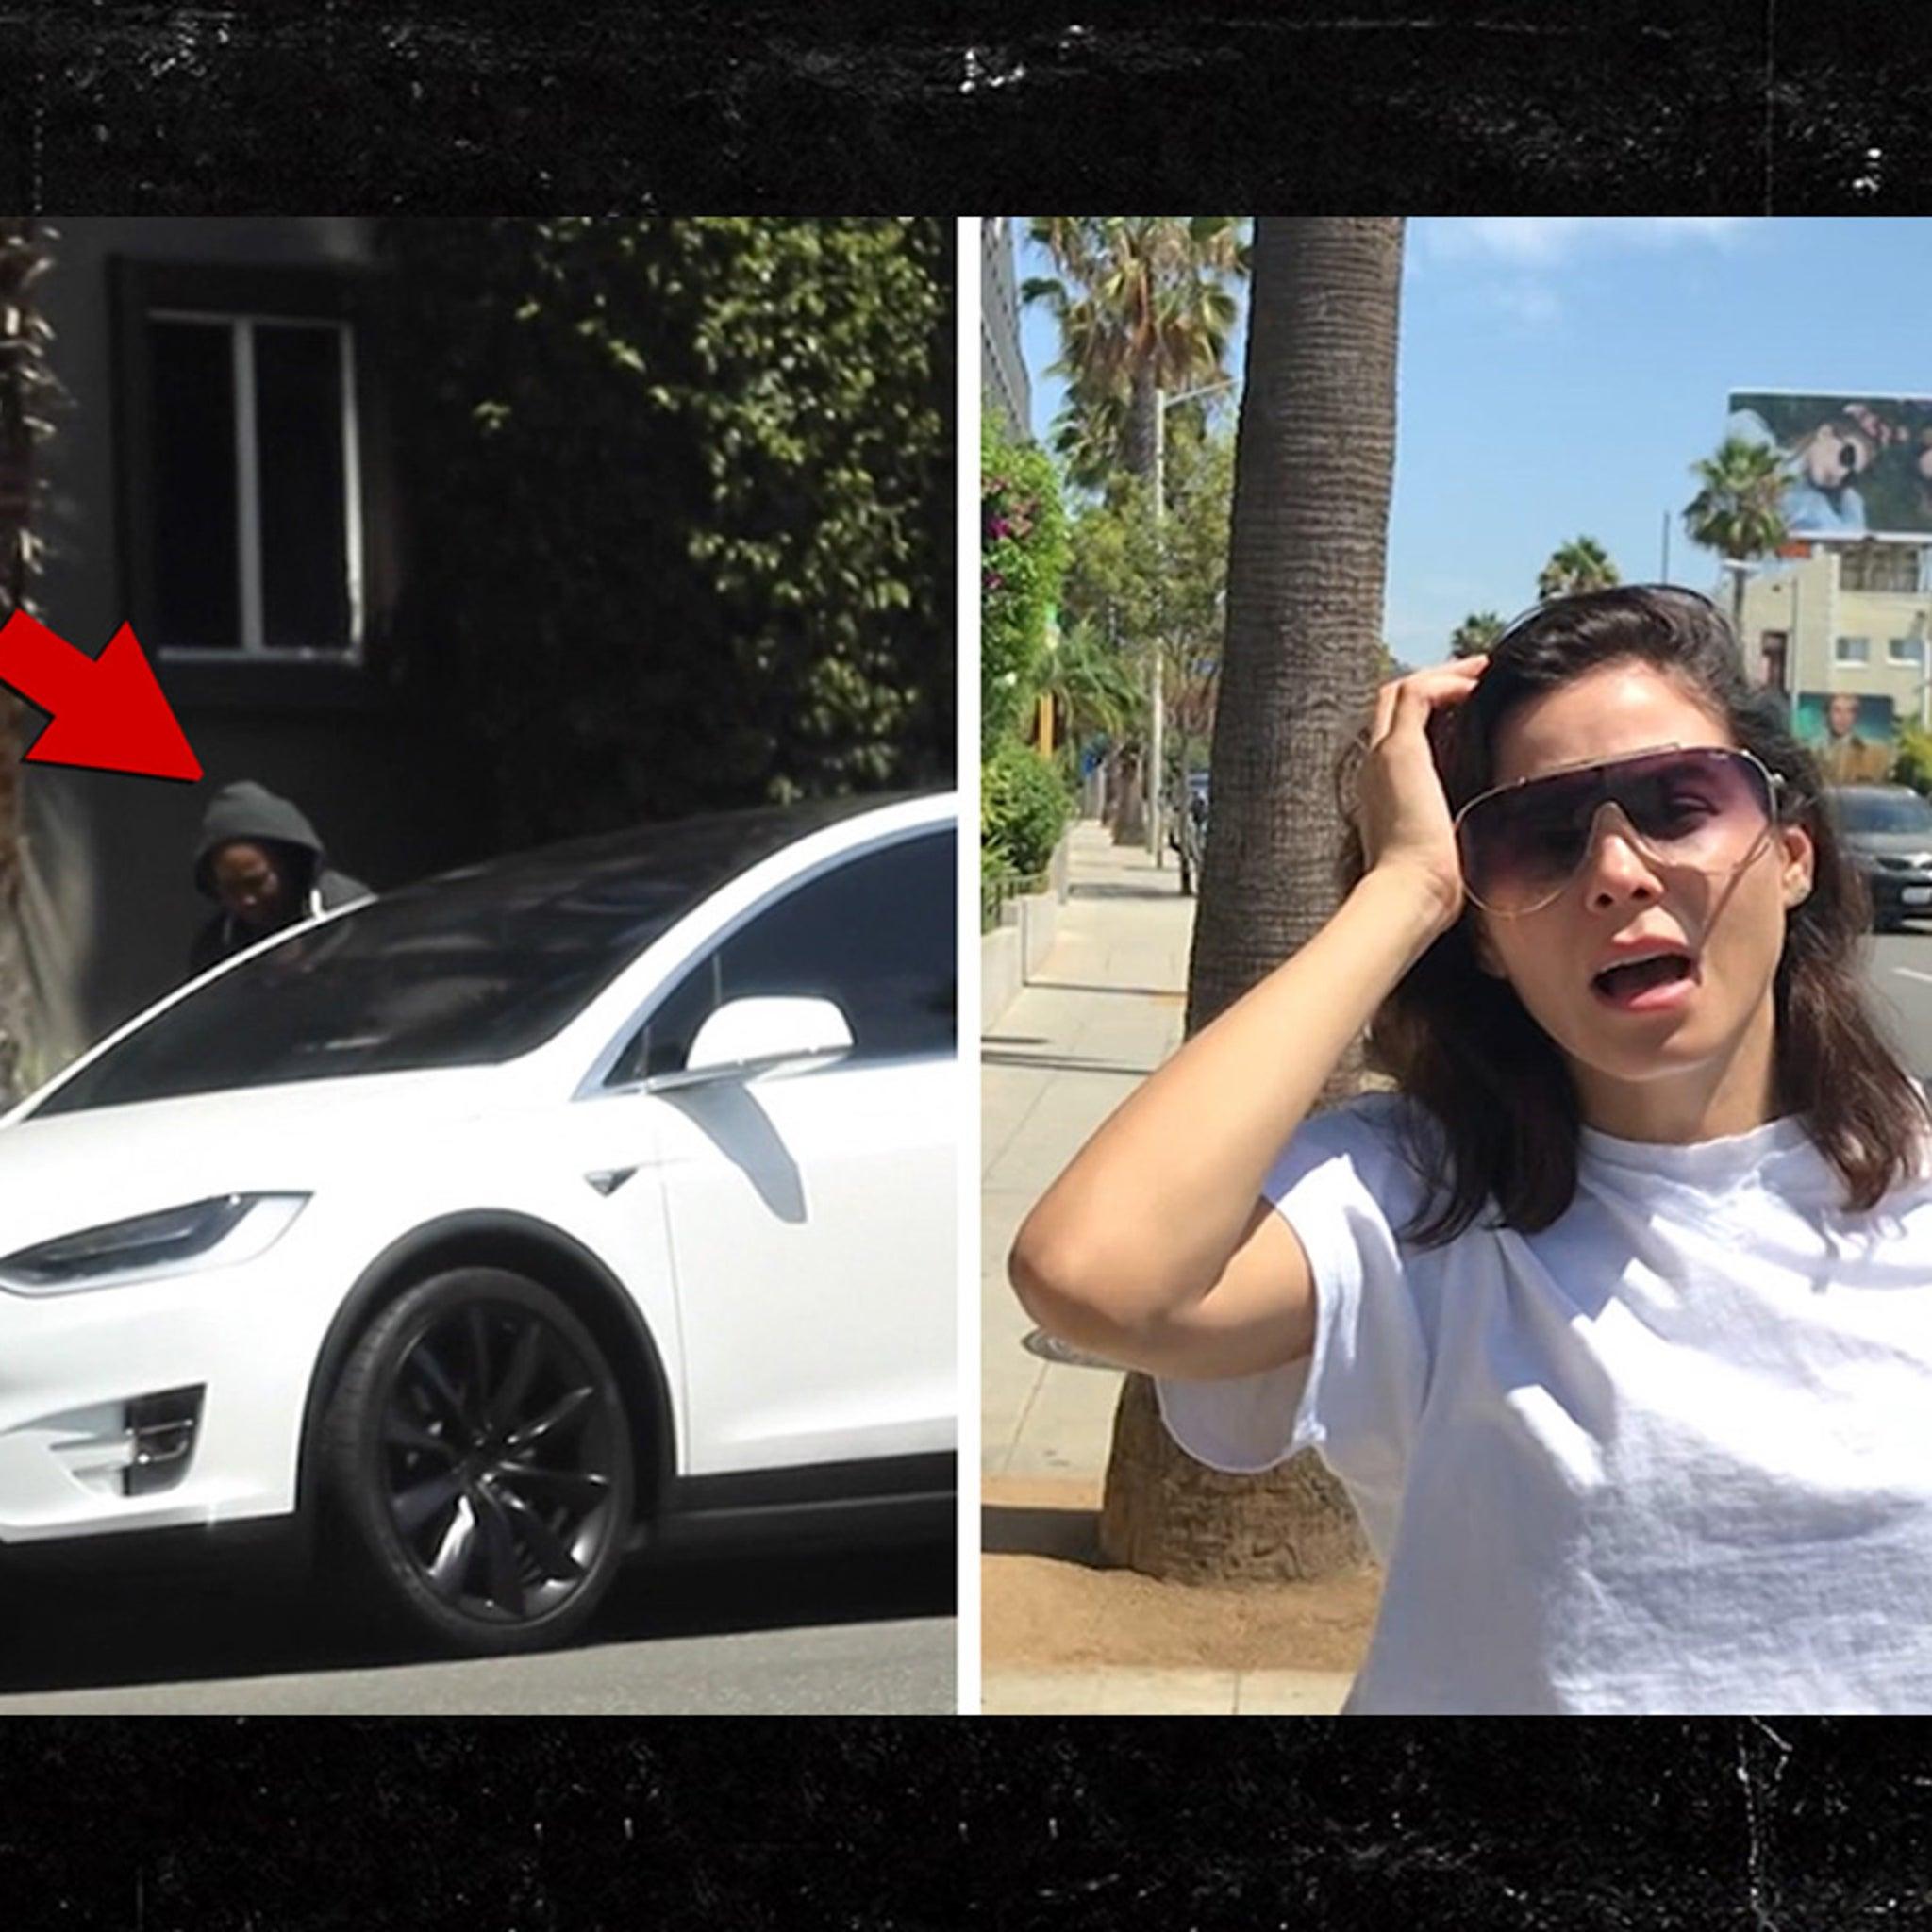 Jenna Dewan's Purse Stolen During On Camera Smash and Grab